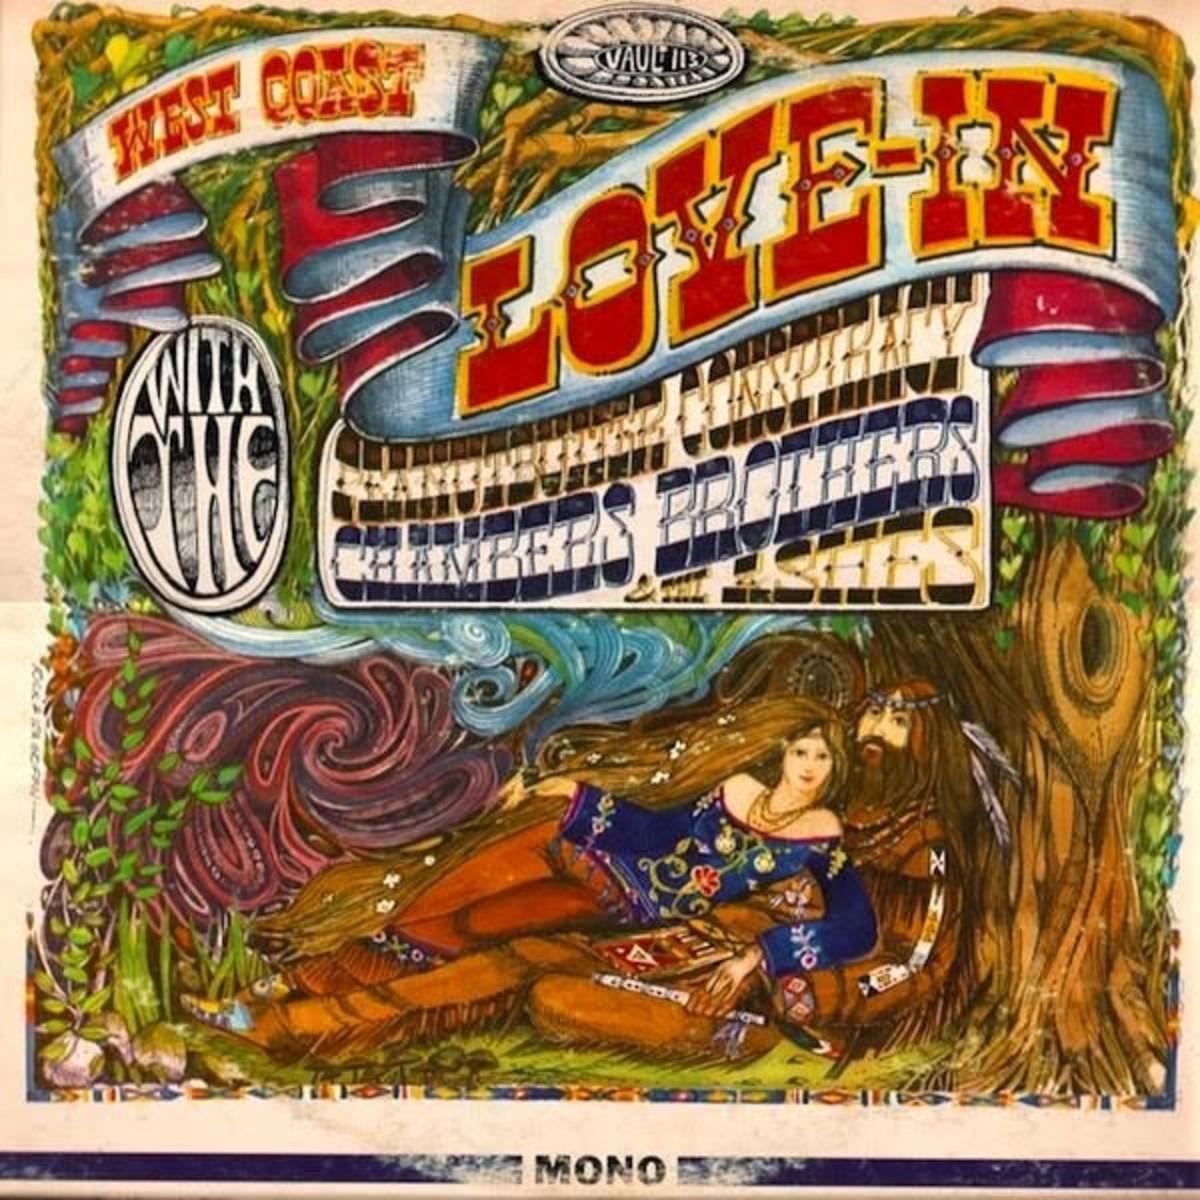 "Various Artists ""West Coast Love-In"" Vault Records LP-113 12"" LP Vinyl Record, US Pressing (1967) Album Cover Art by Rick Griffin"